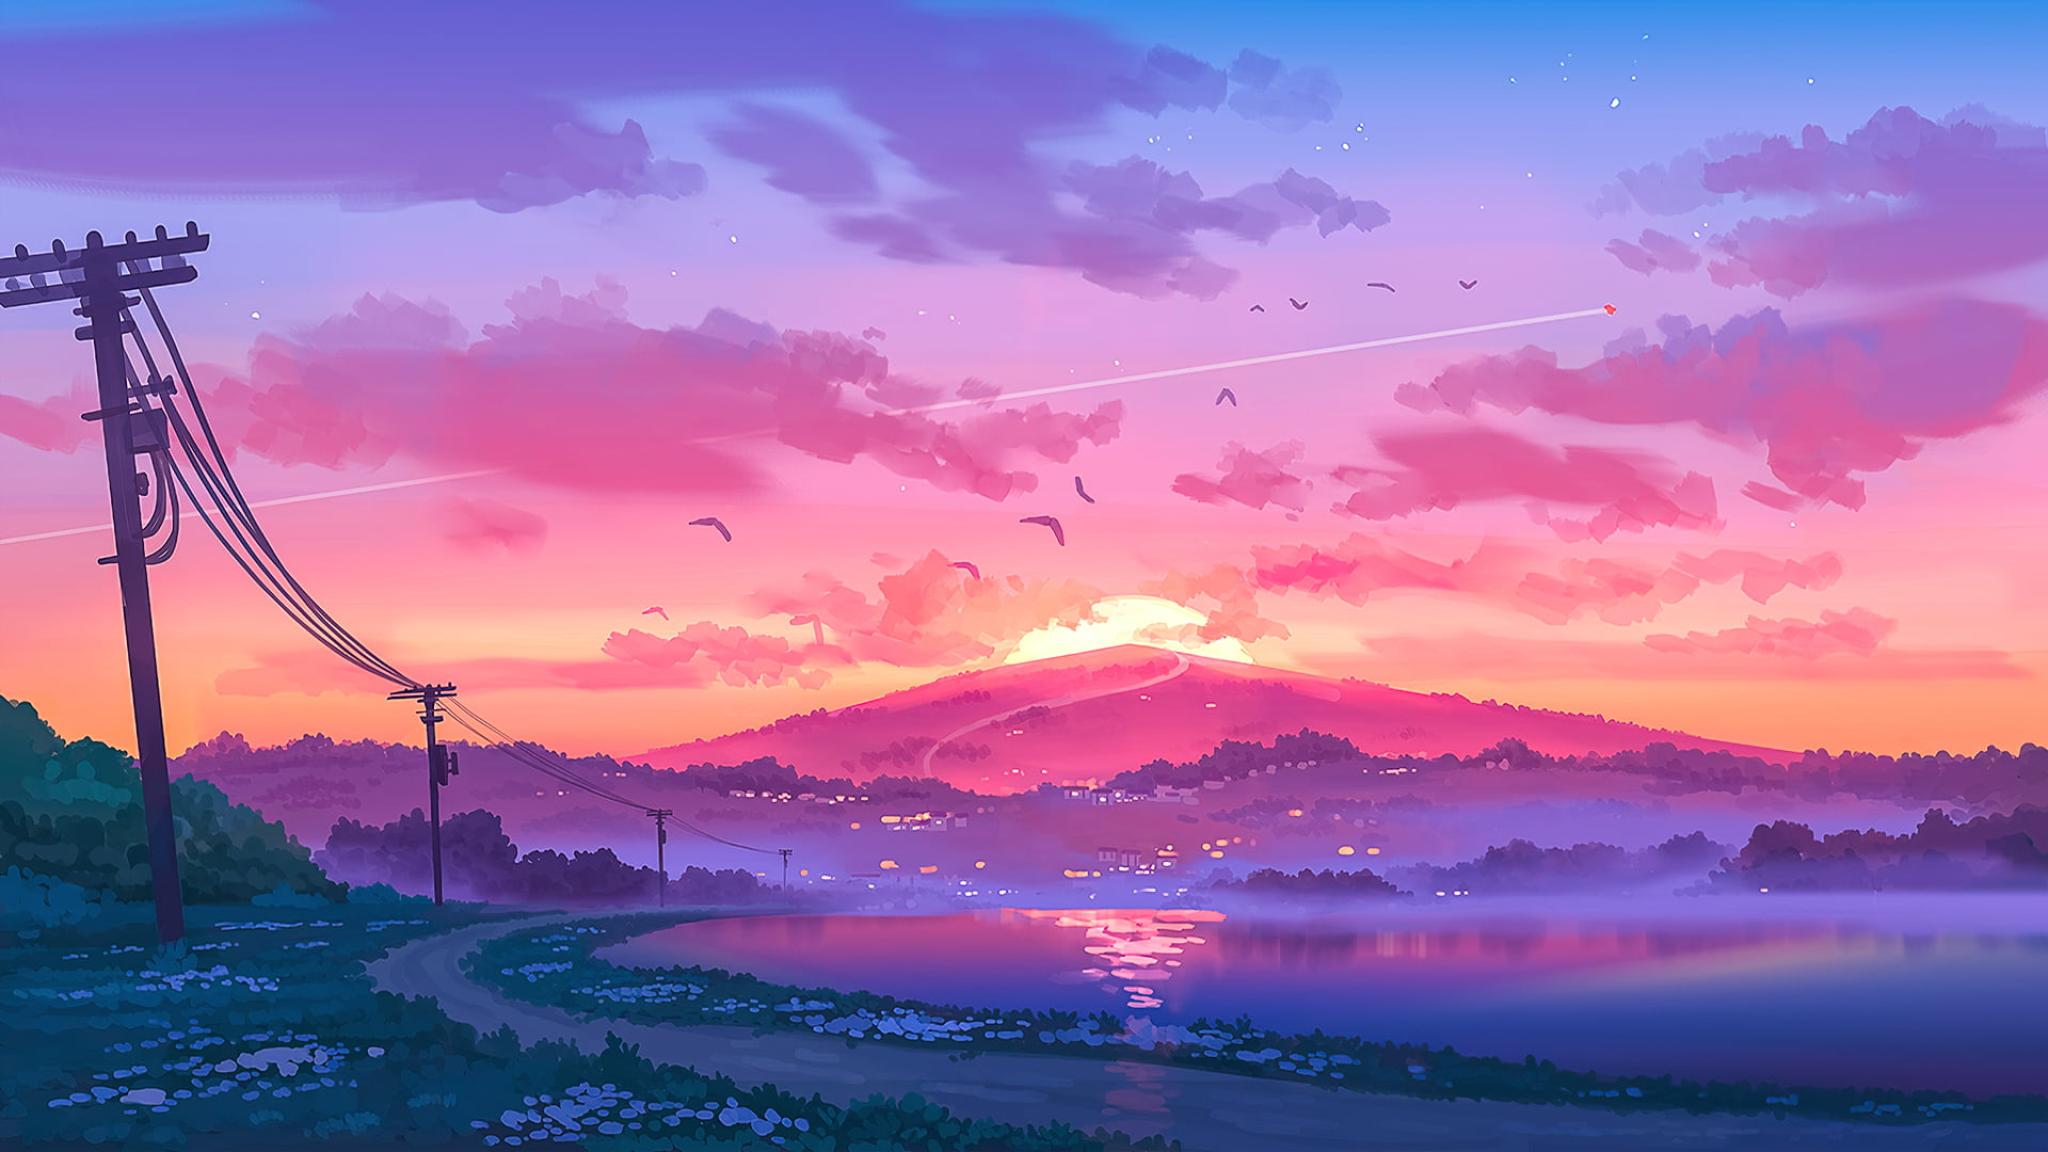 2048x1152 Landscape Pixel Art 2048x1152 Resolution